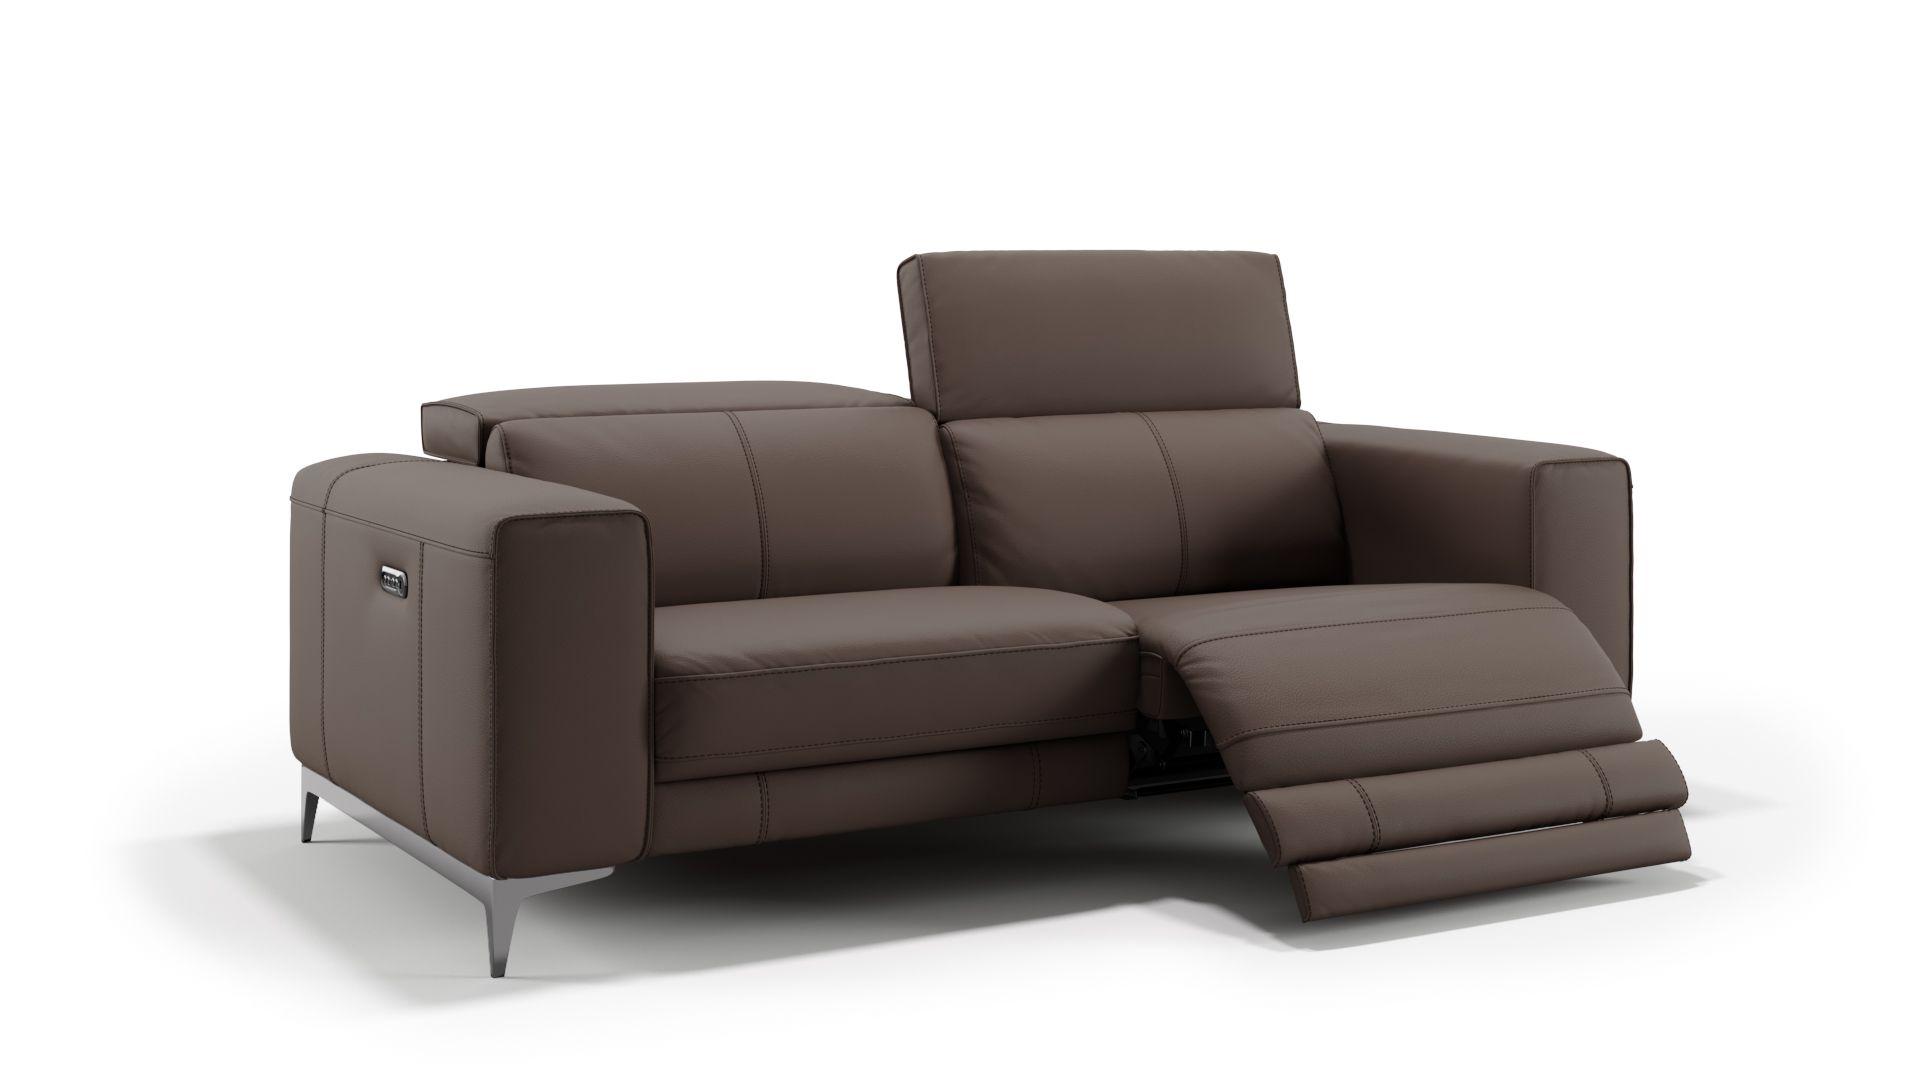 Leder 3-Sitzer Sofa CUPELLO